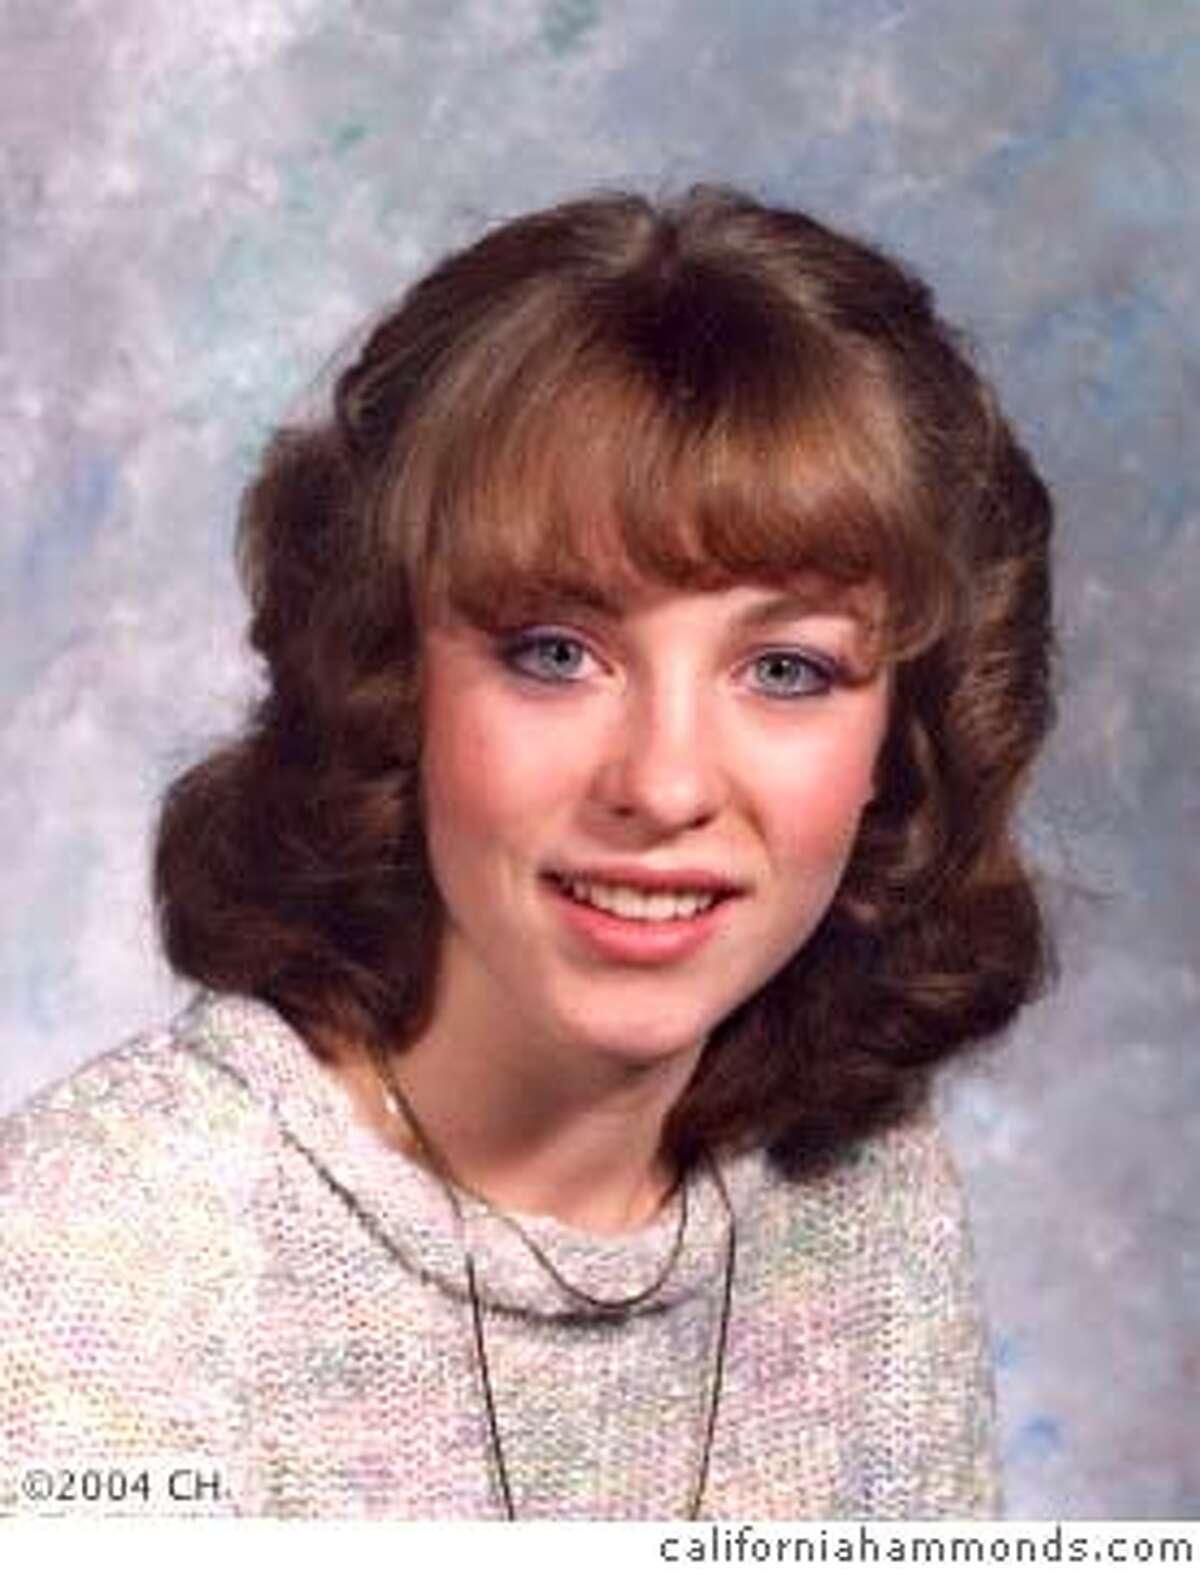 Cheryl Hammonds from blog by her husband. High school?